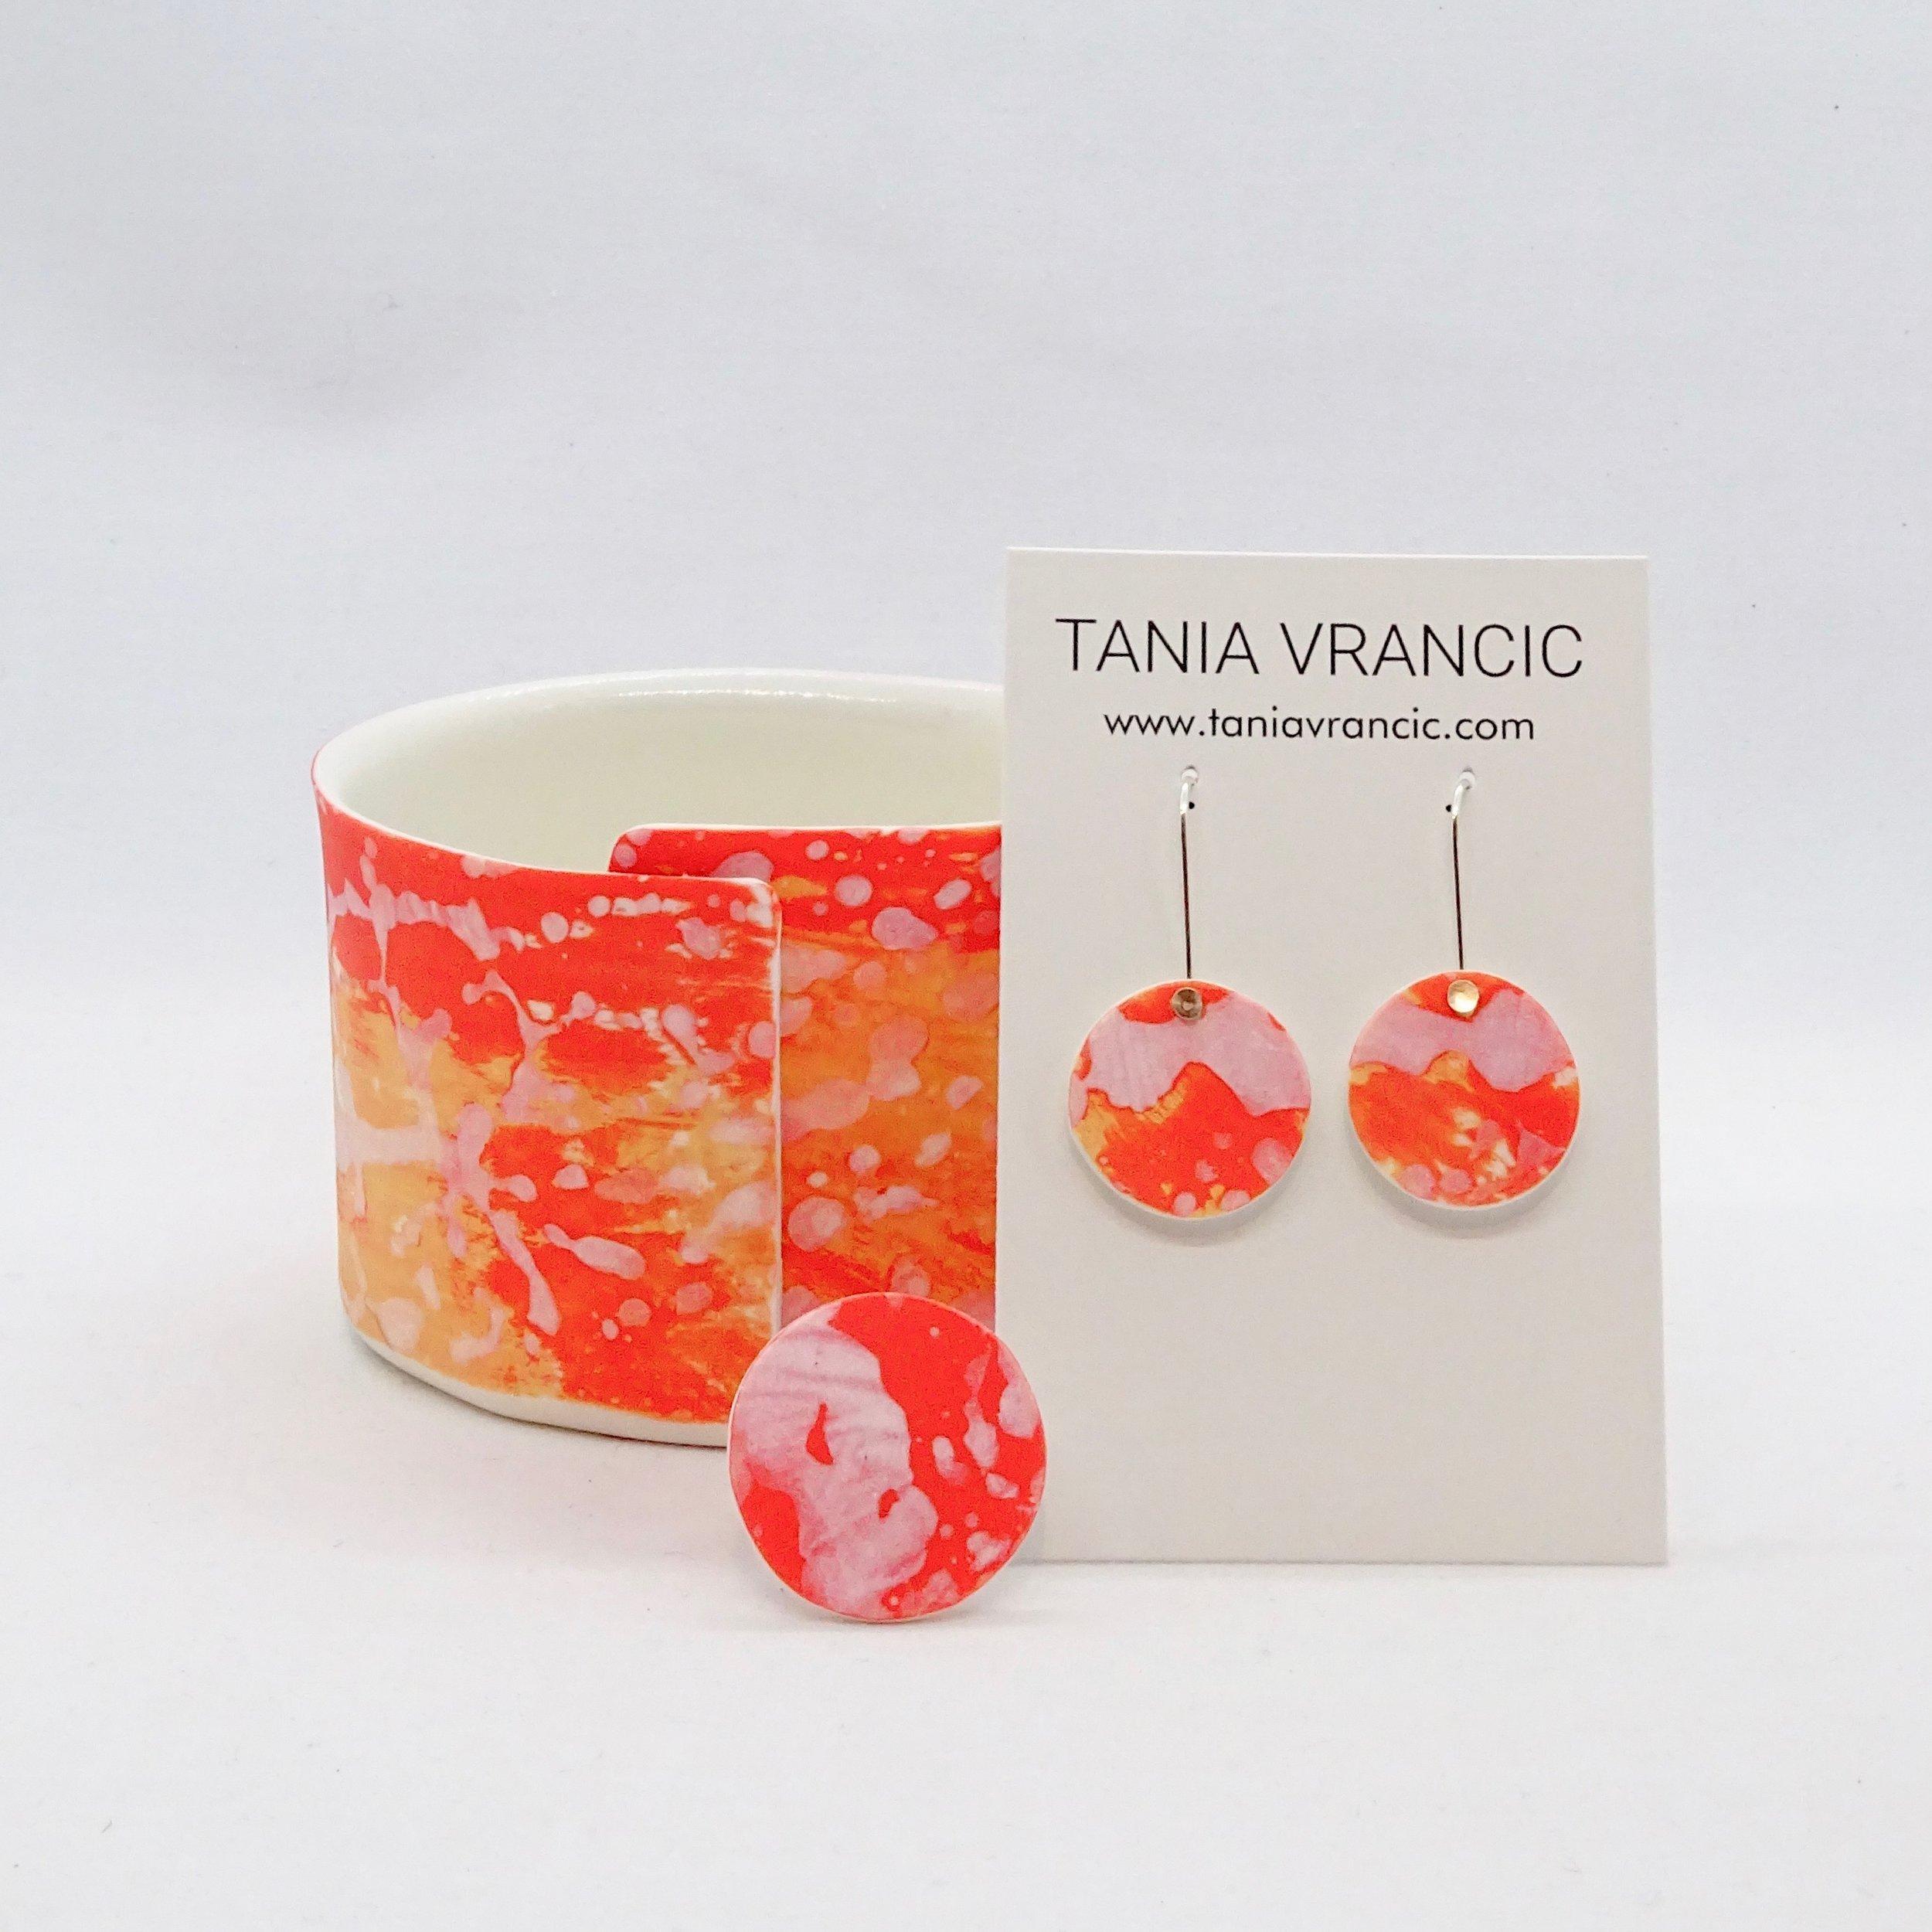 Tania Vrancic 1.jpg